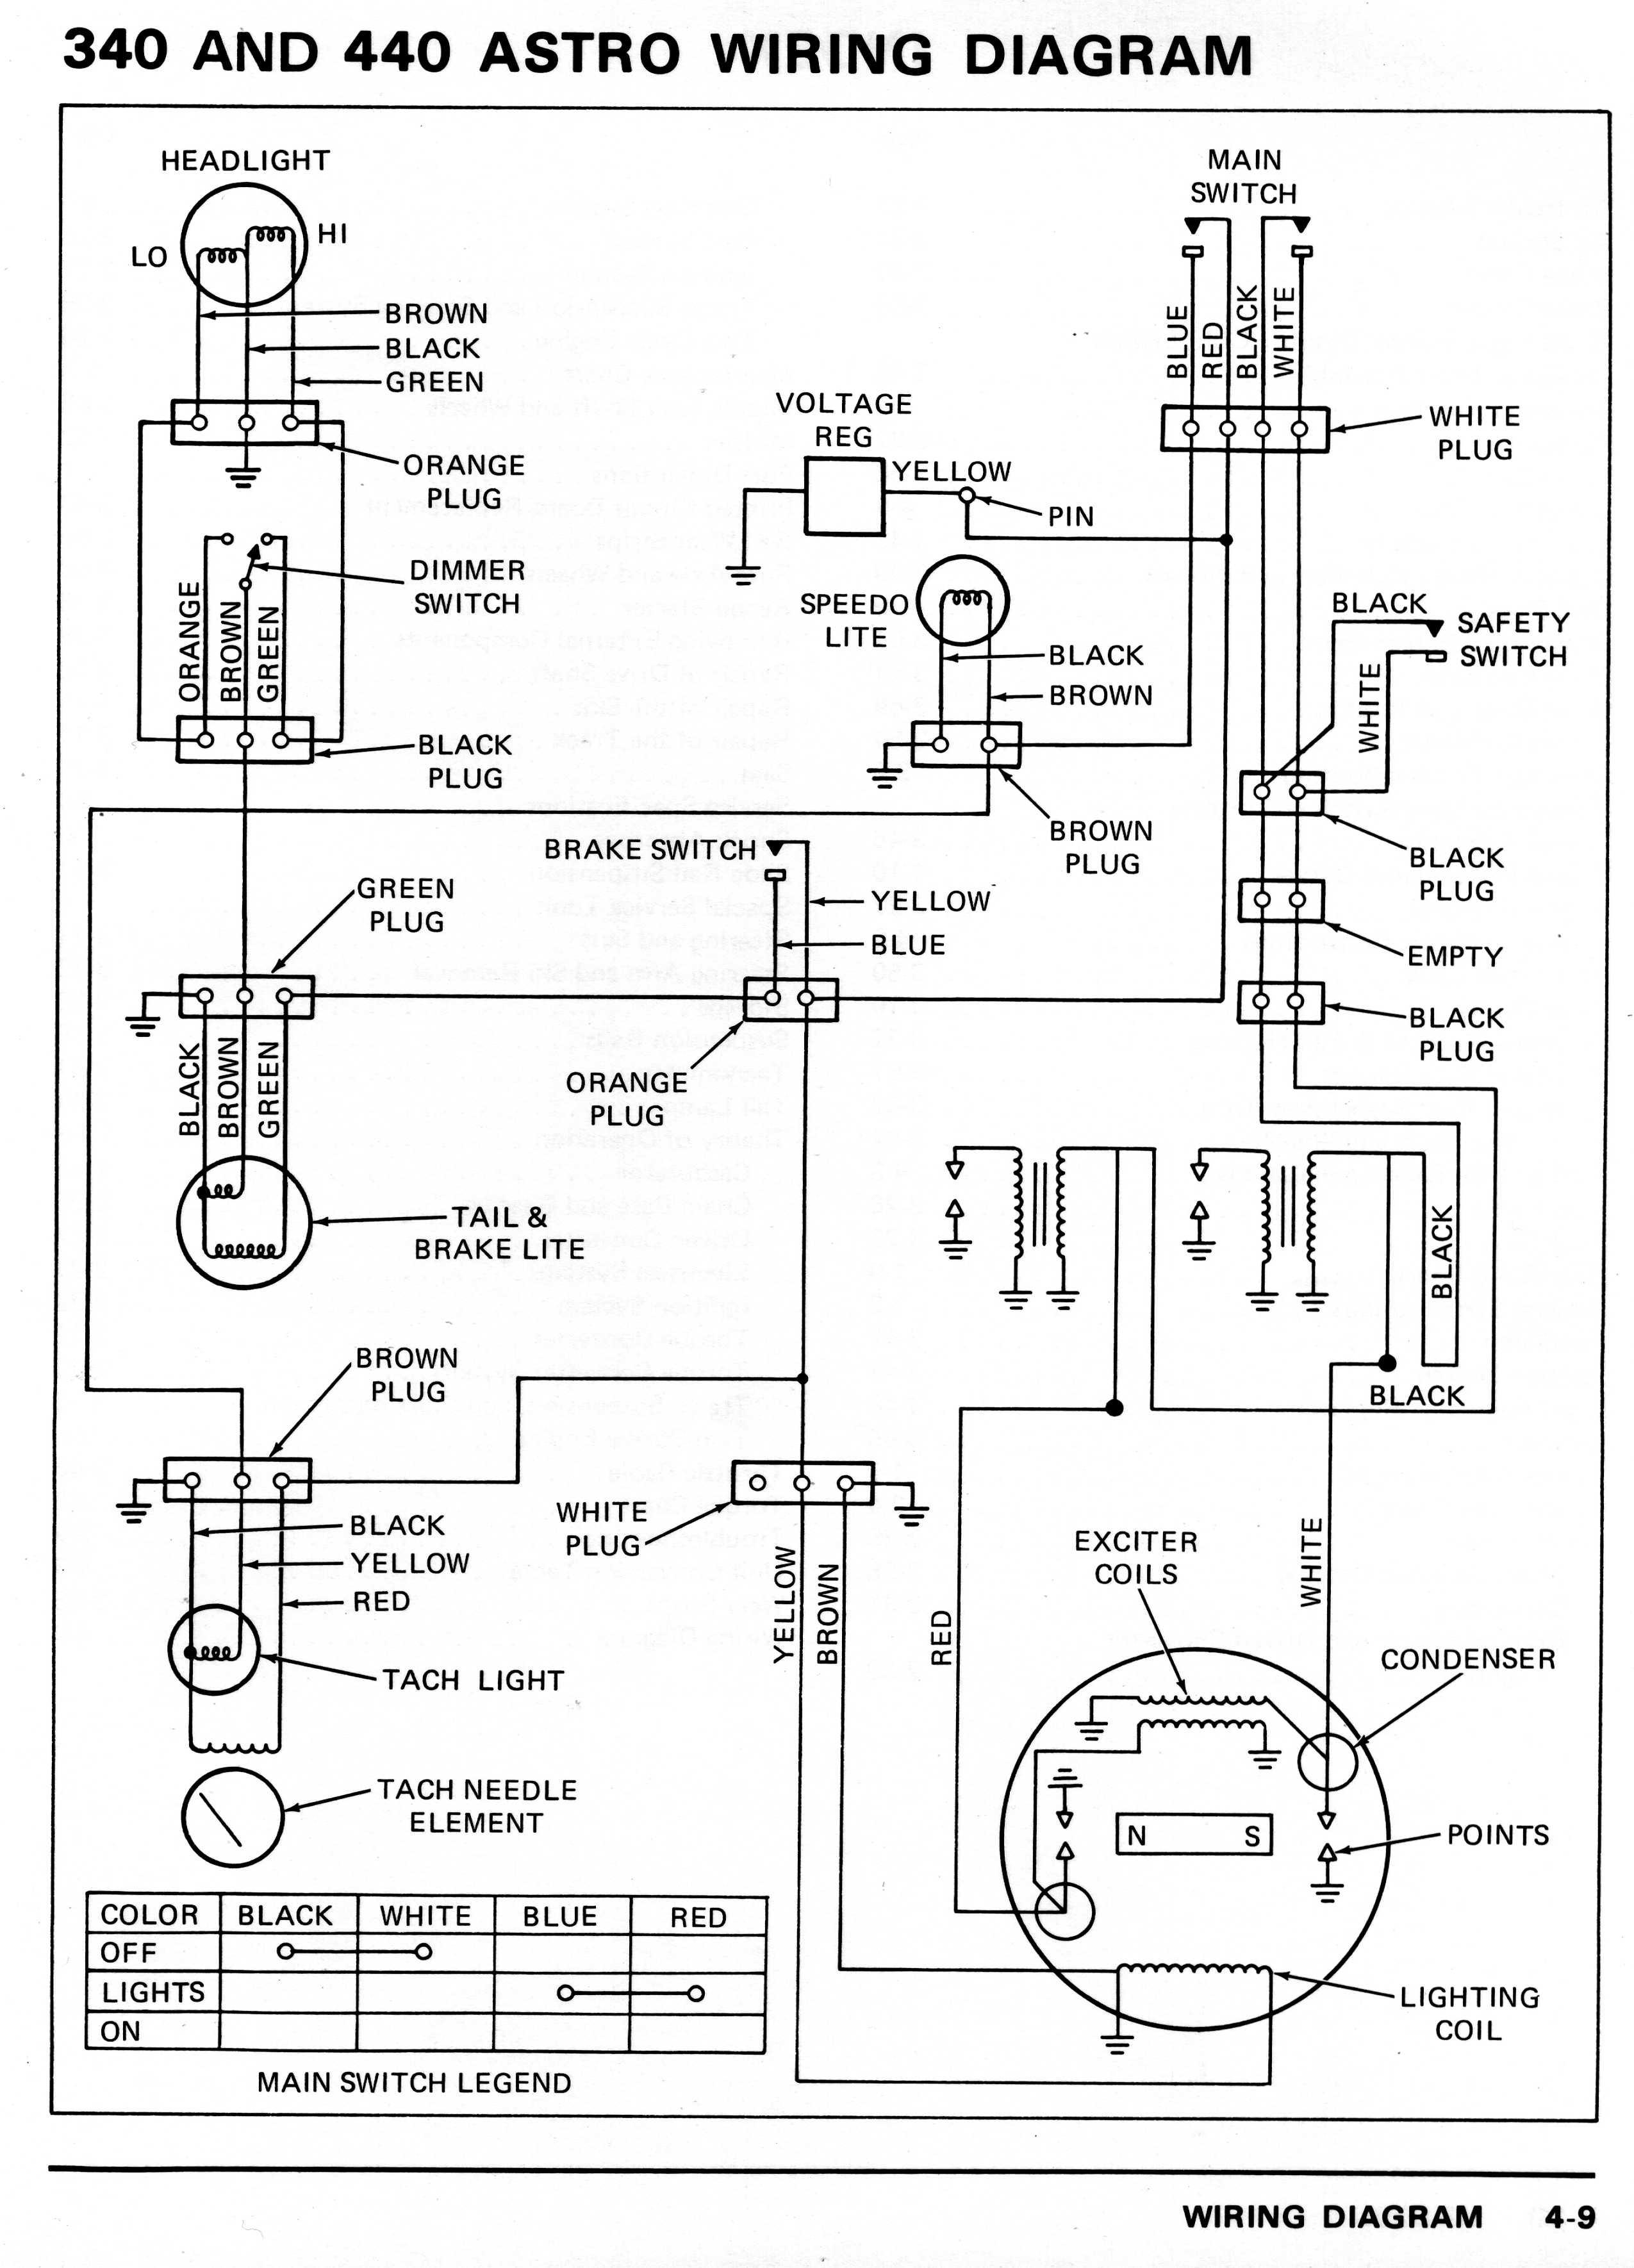 1977 kawasaki ke100 wiring diagram images 1977 kz1000 wiring wiring diagram kawasaki mule 1982